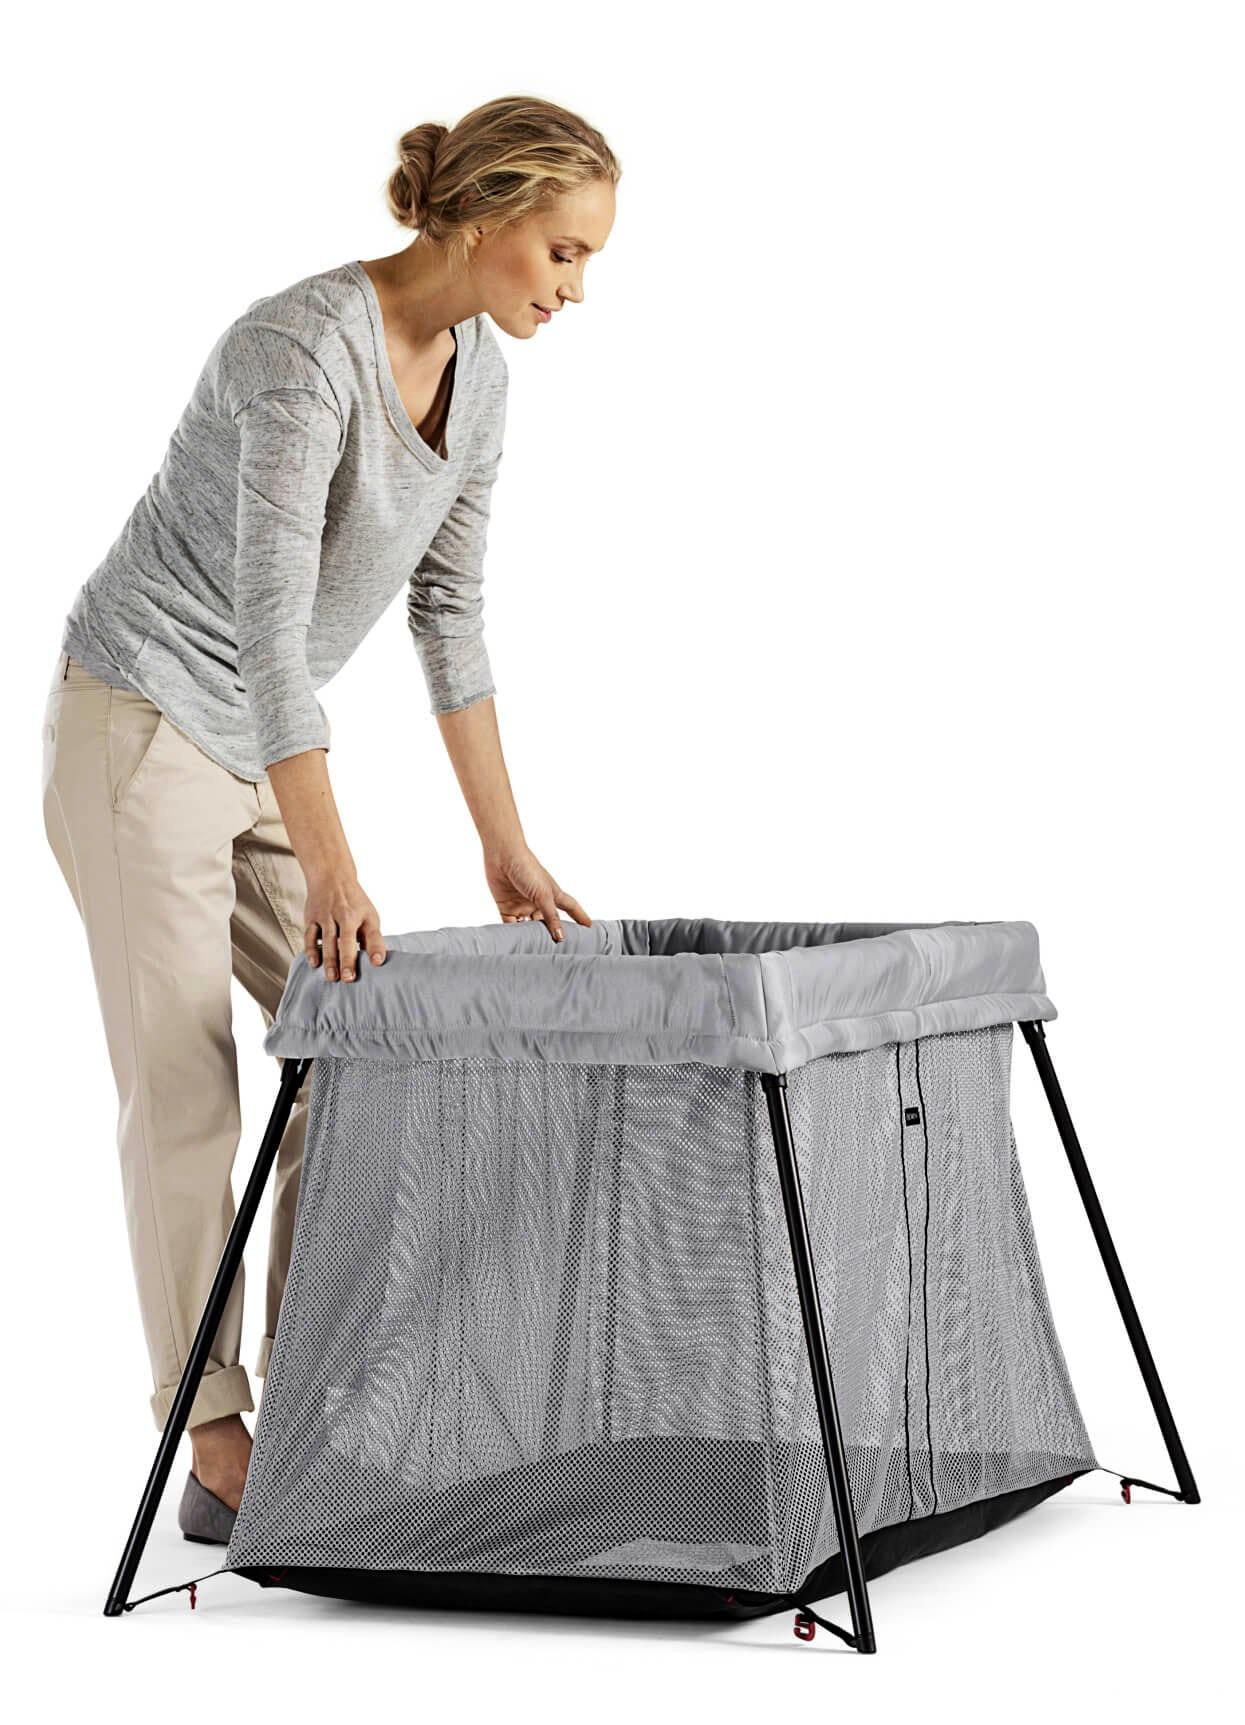 Travel Crib Light Perfect At Home Amp Away Babybj 214 Rn